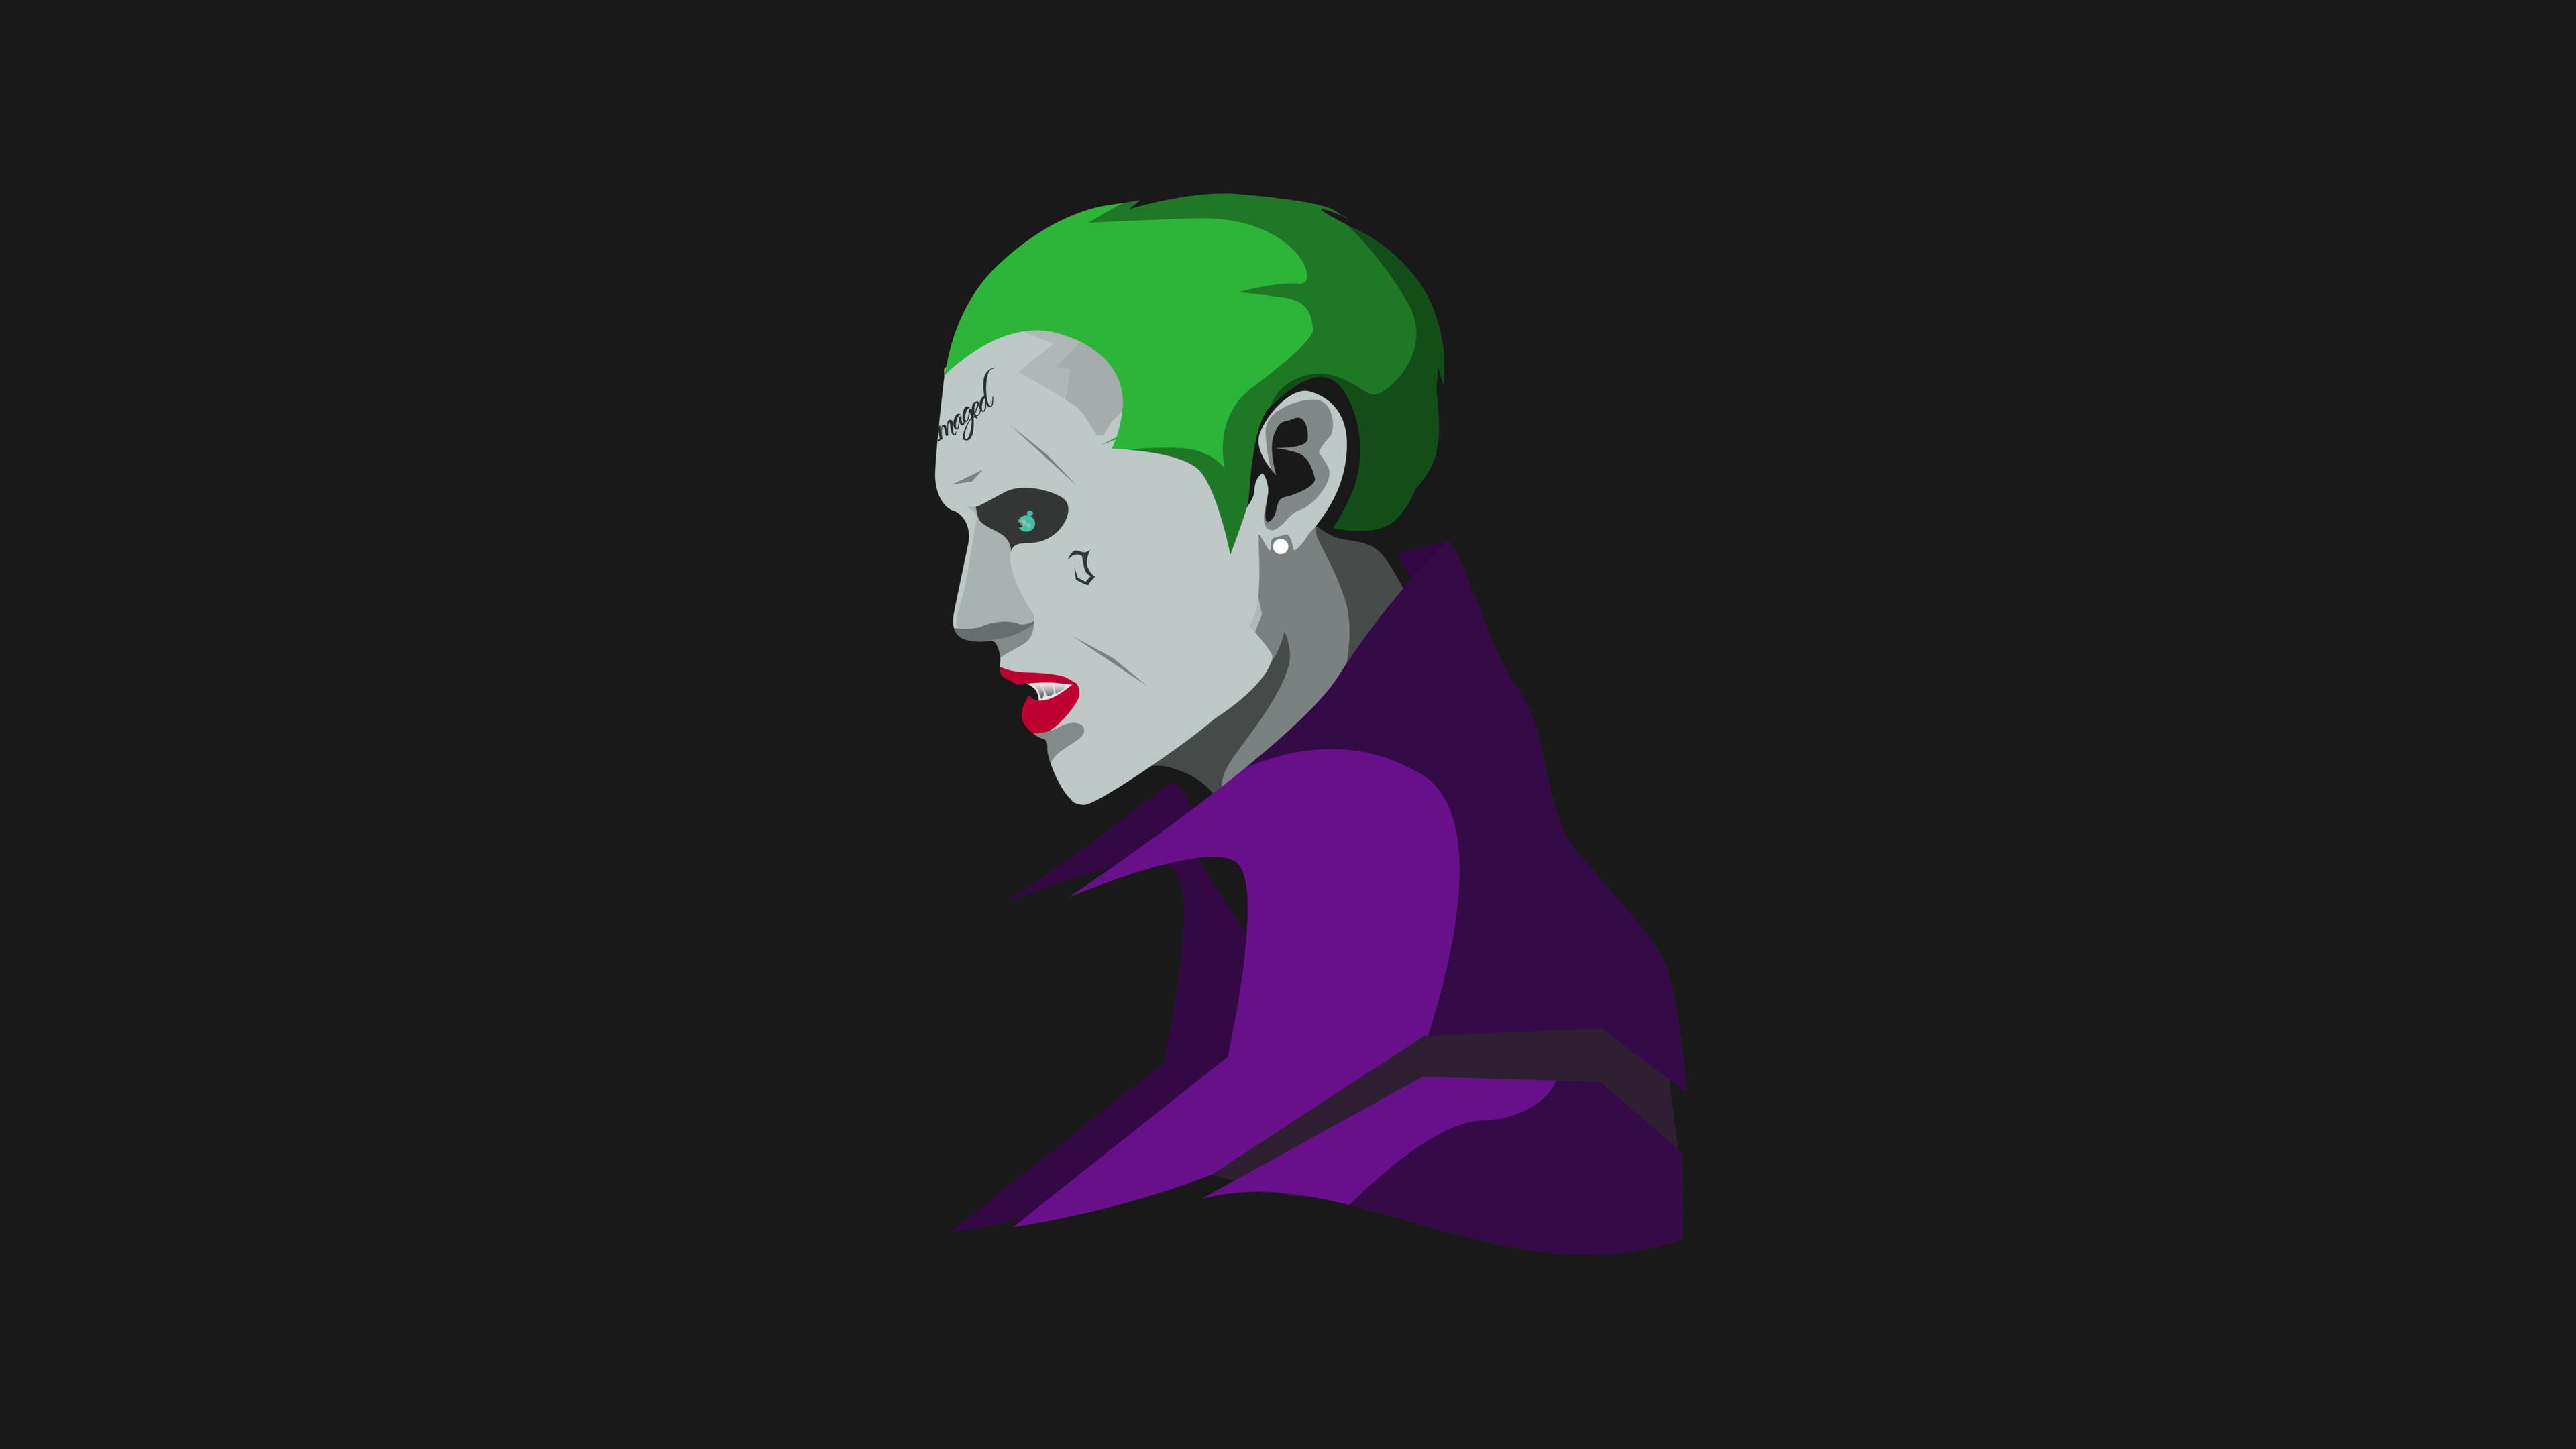 suicide squad joker minimalism 1536523684 - Suicide Squad Joker Minimalism - supervillain wallpapers, minimalism wallpapers, joker wallpapers, hd-wallpapers, digital art wallpapers, artwork wallpapers, artstation wallpapers, artist wallpapers, 4k-wallpapers